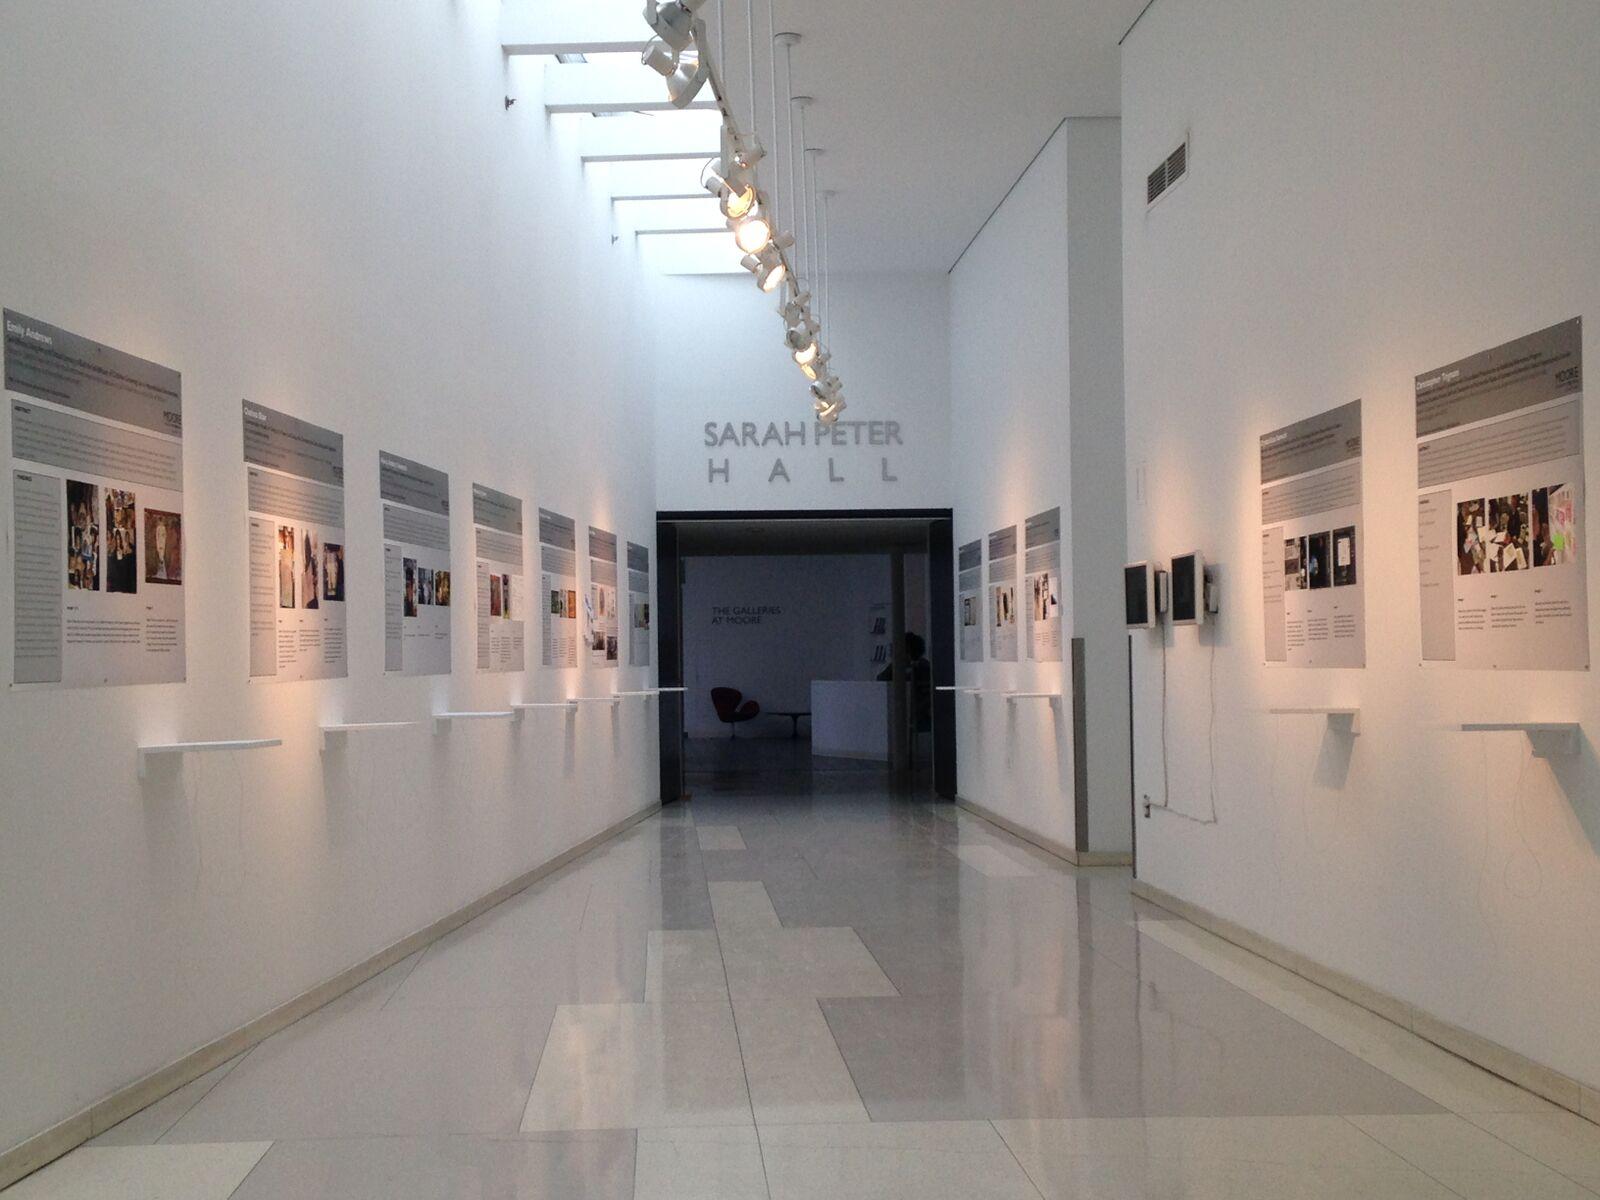 Moore gallery hallway.